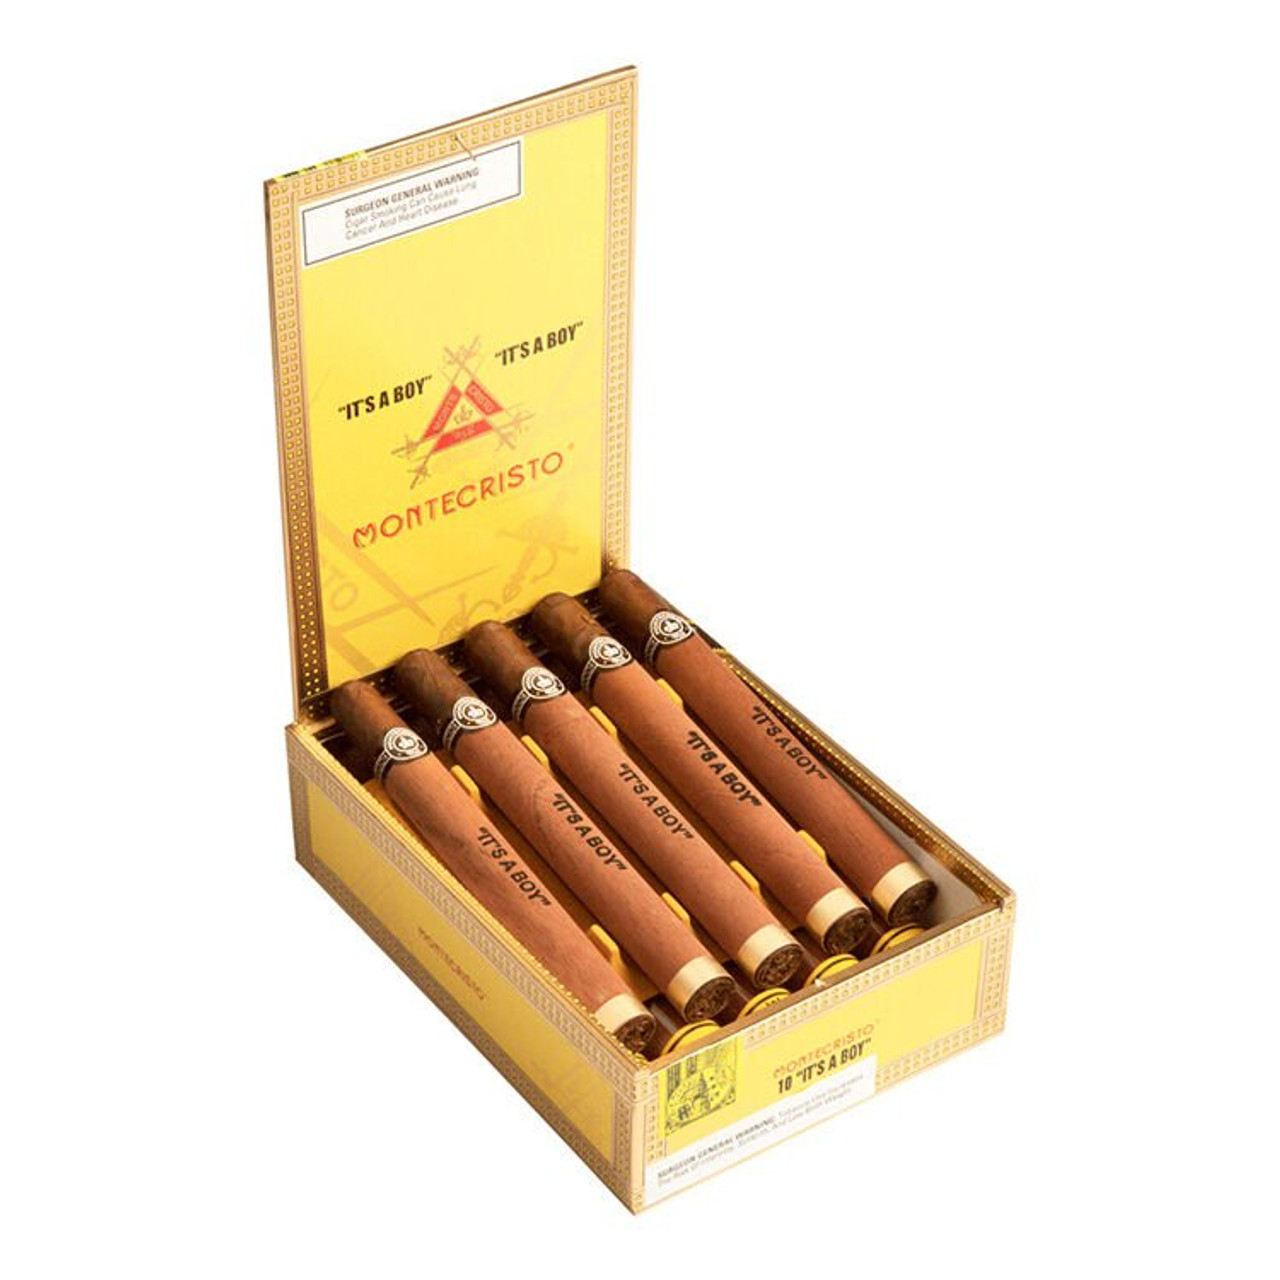 Montecristo Habana 2000 Clemenceaus Boy Cigars - 7.12 x 47 (Box of 10)